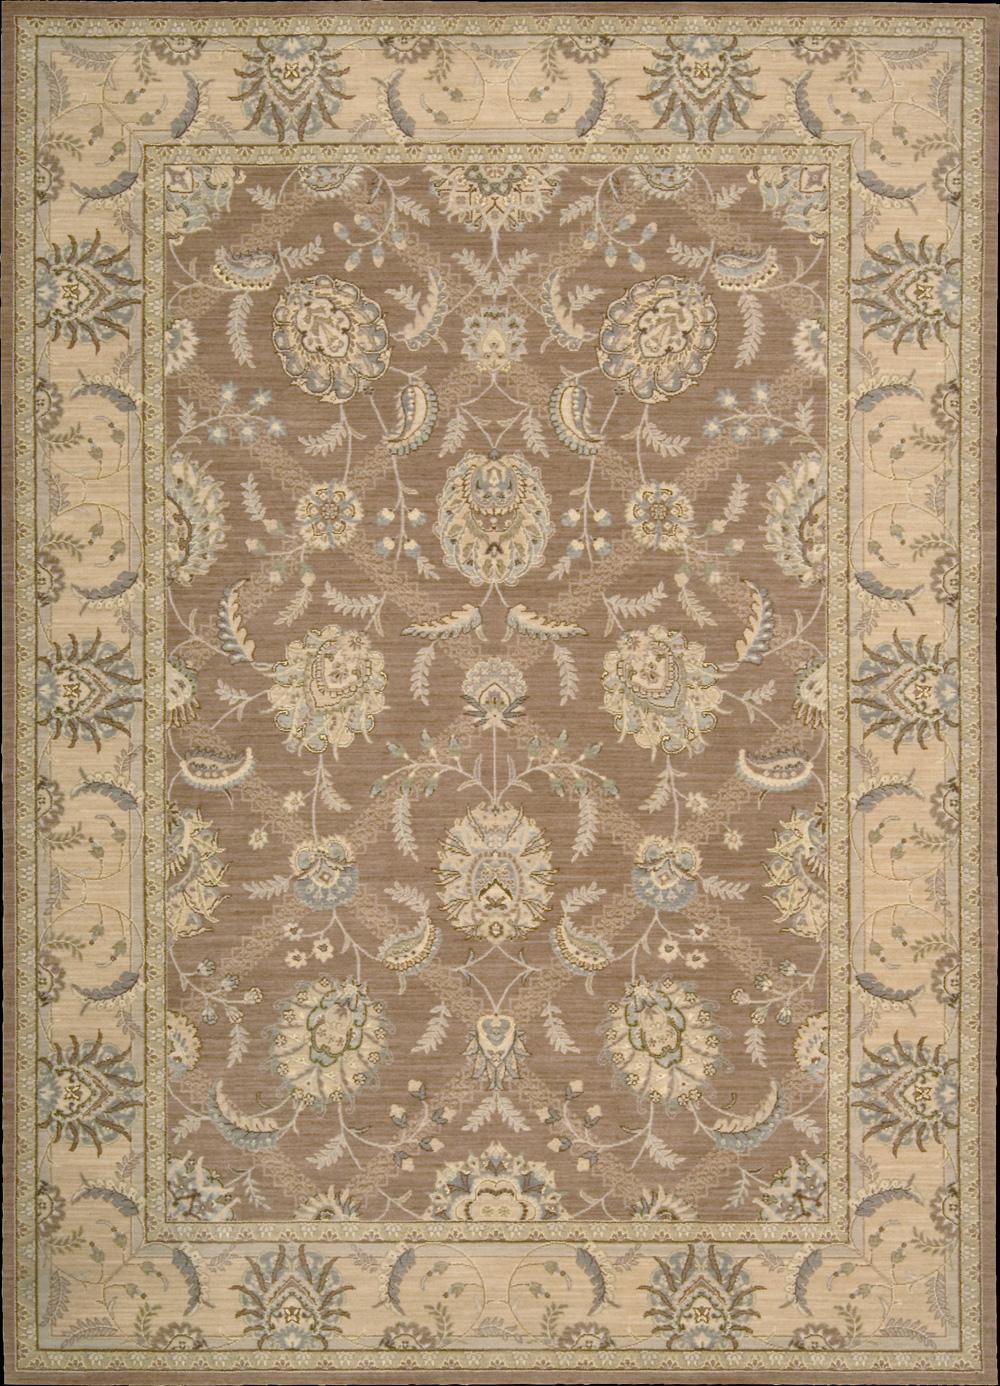 Nourison Persian Empire Area Rug 12' x 15' - Item Number: 25779